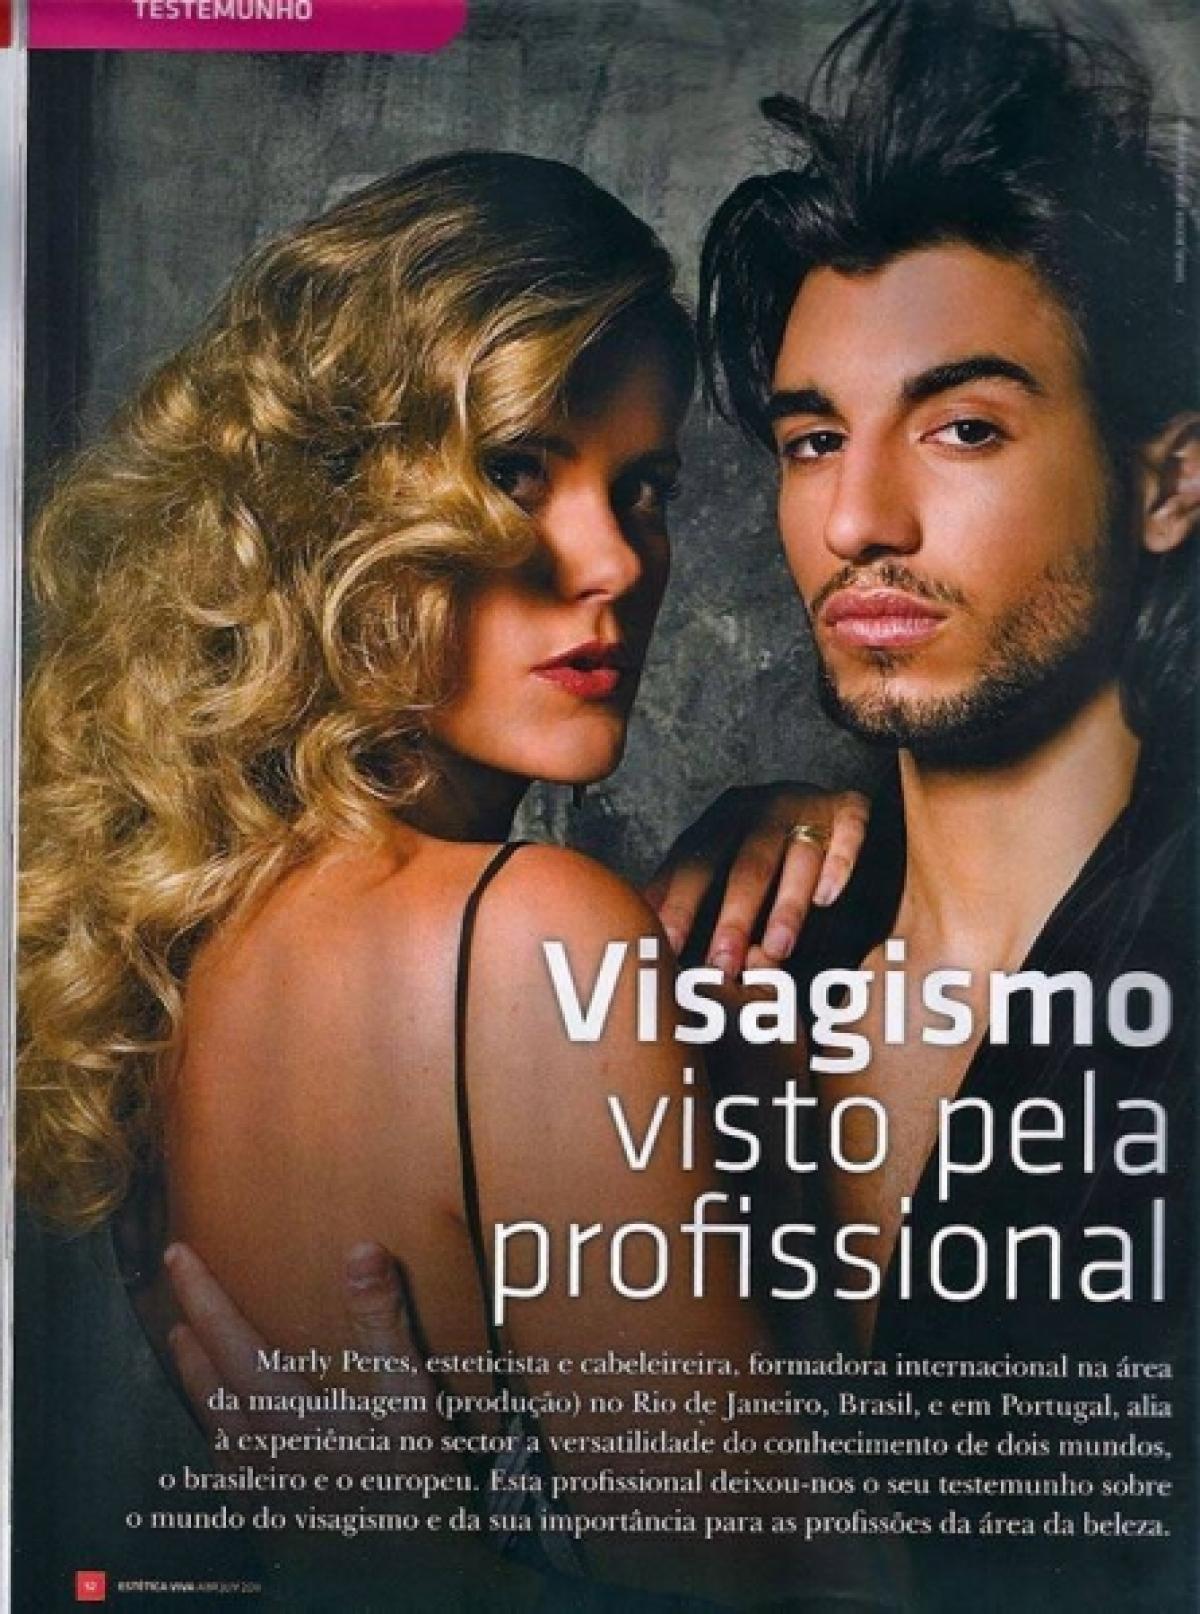 Mp Beauty Center Cursos de Beleza profissionalizantes